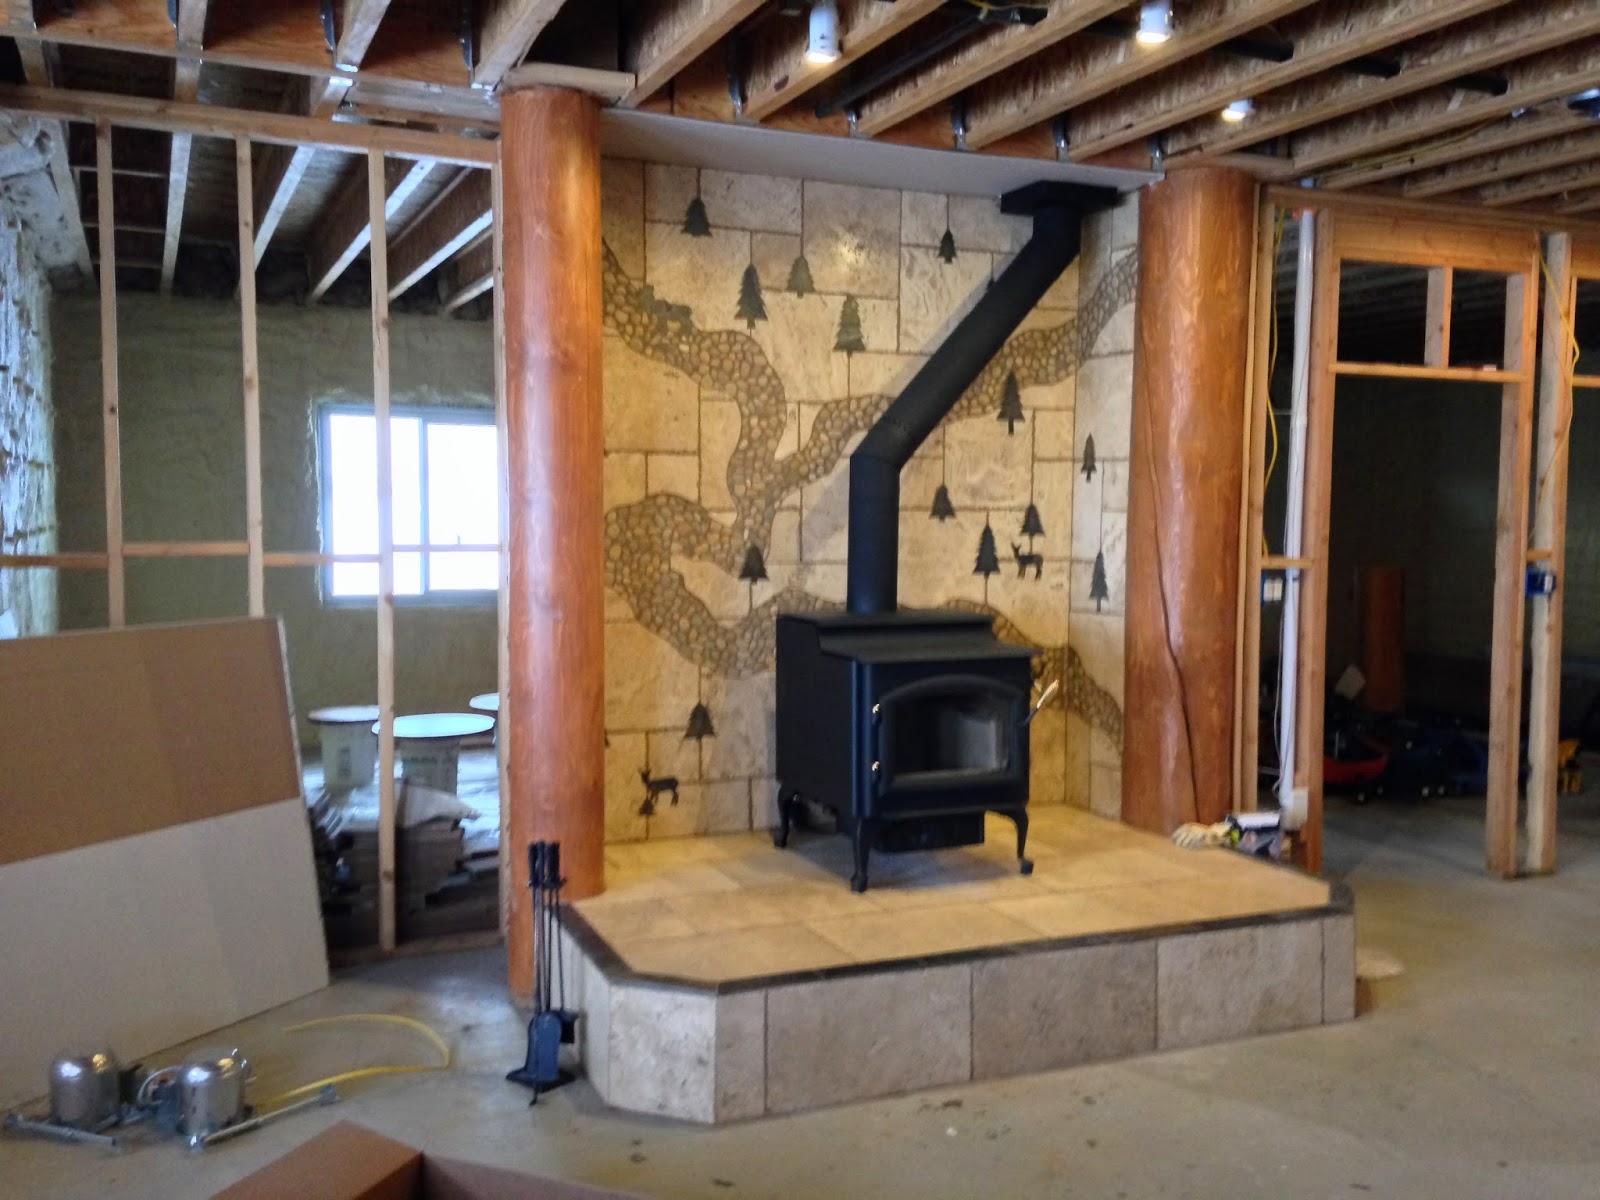 Stallings Sheet Metal: Stove/Fireplace Installation Pics